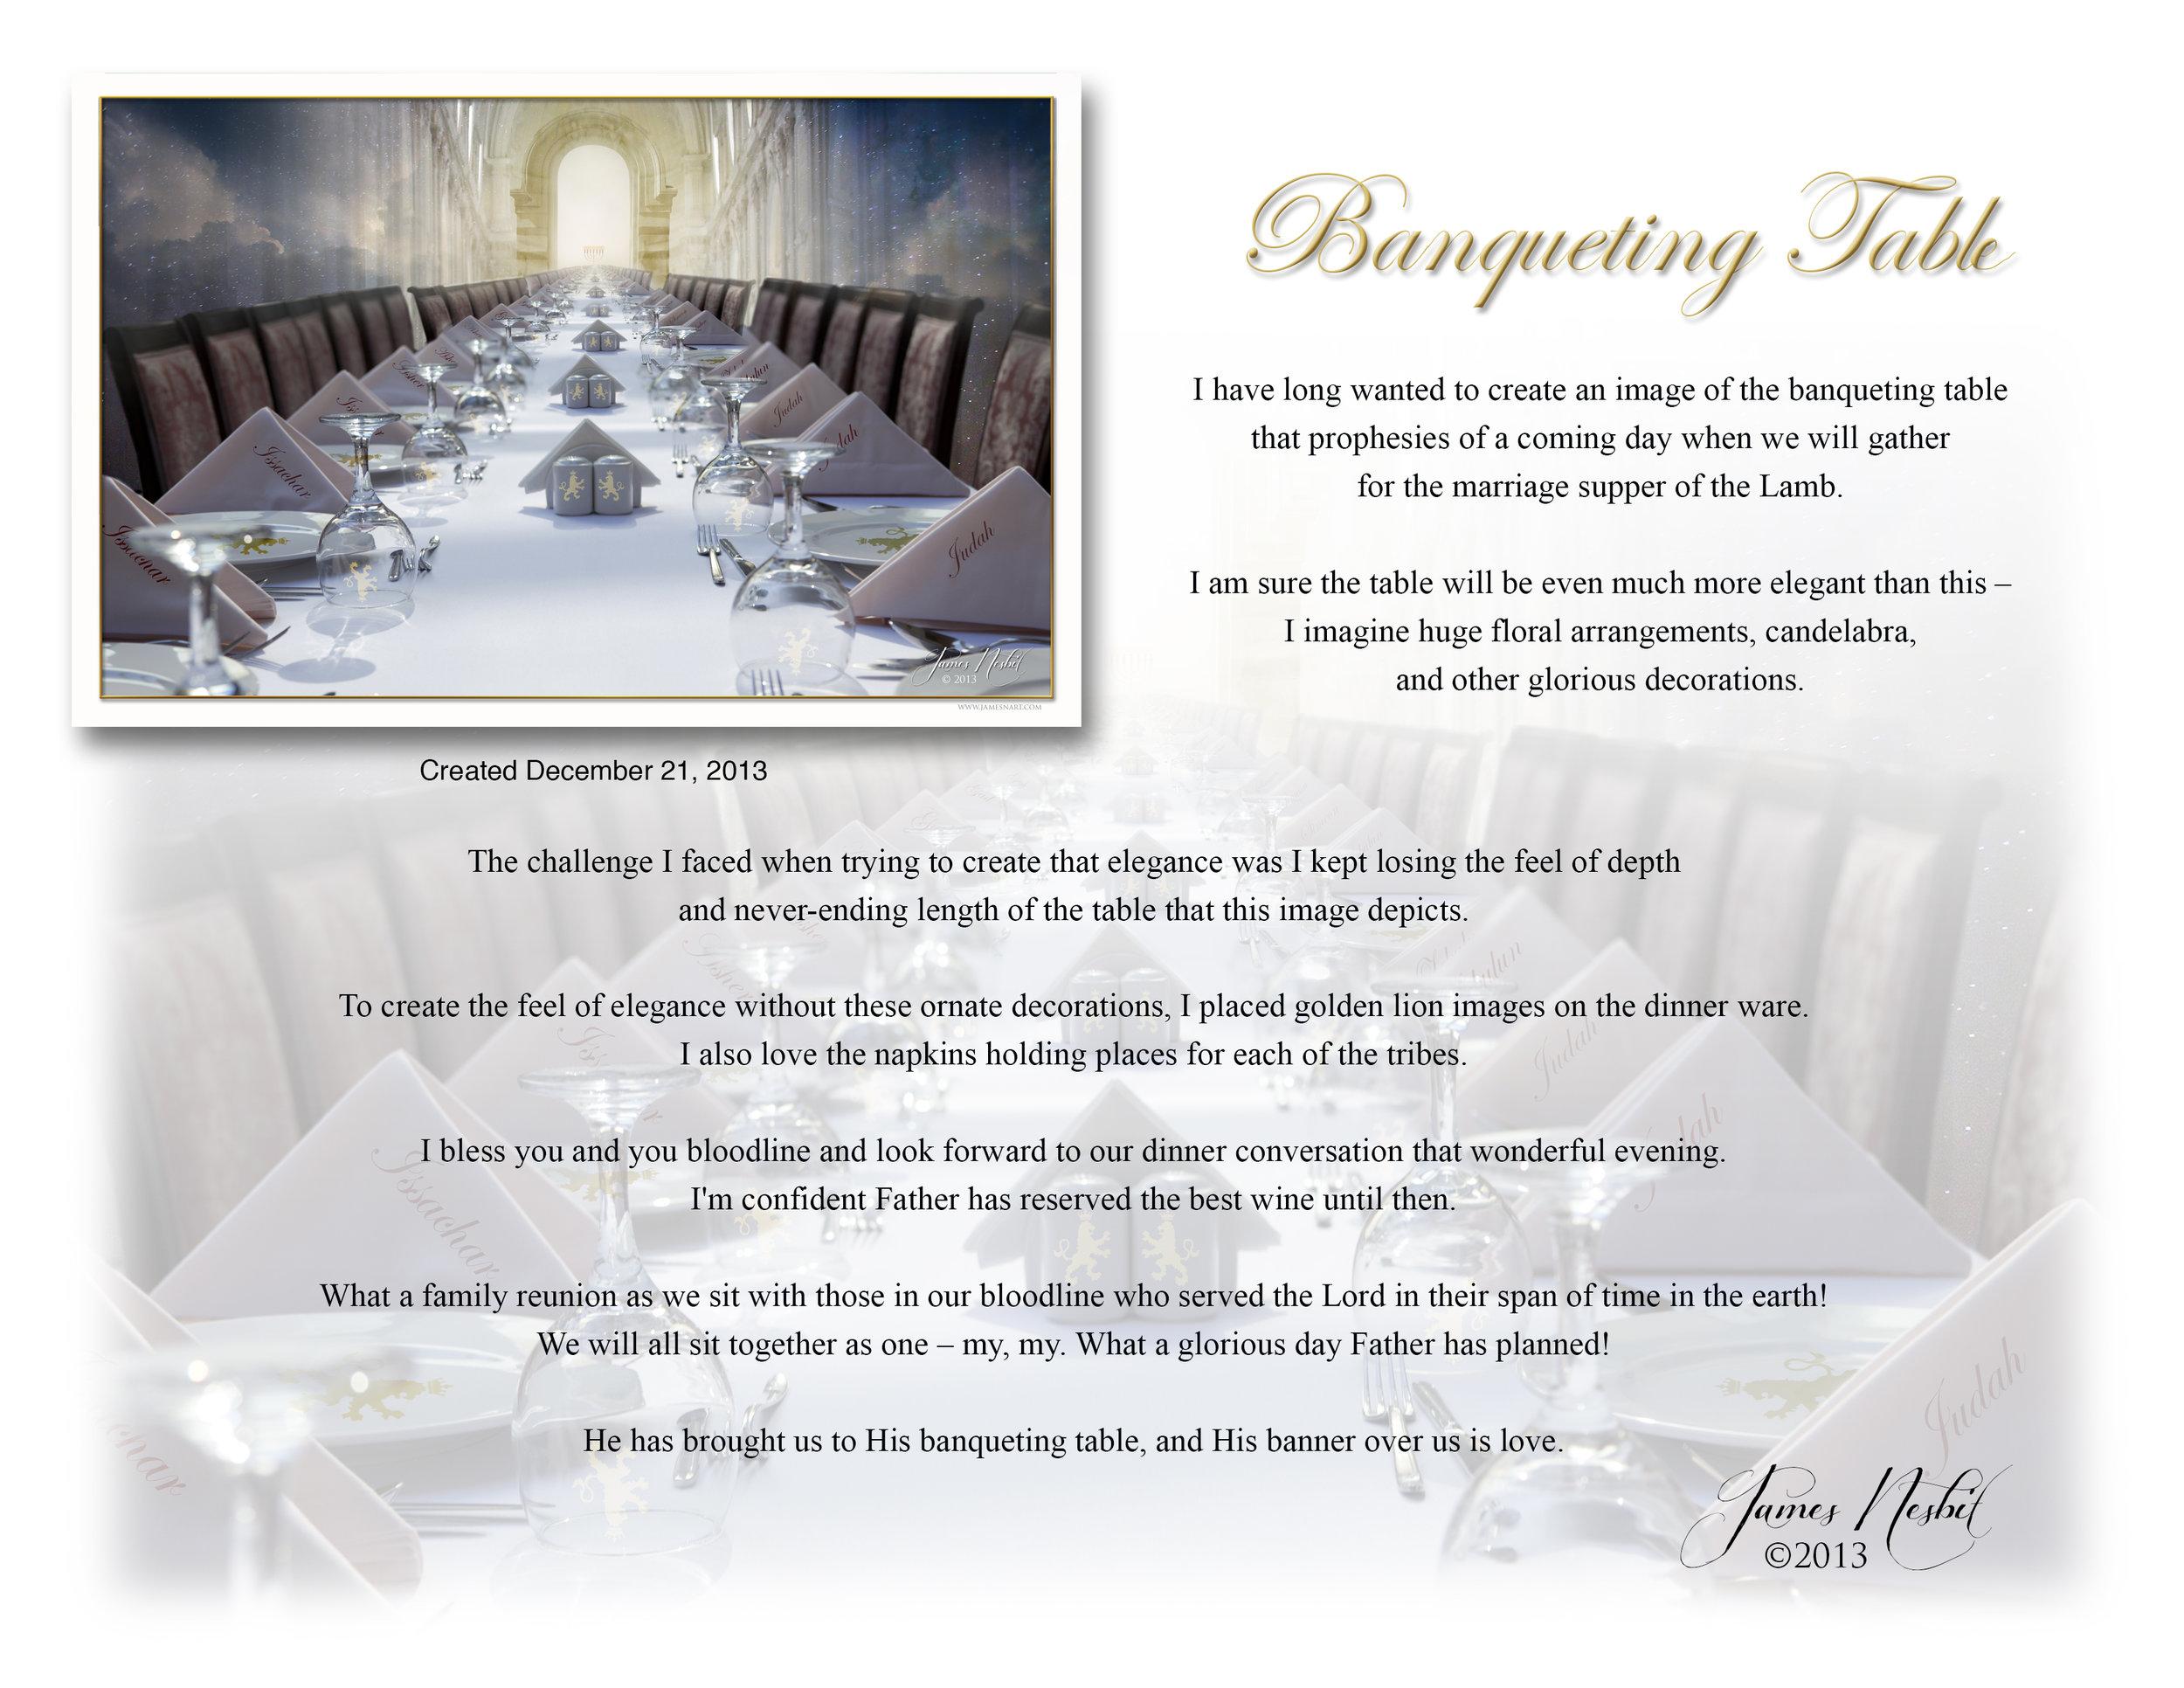 Banqueting Table description.jpg